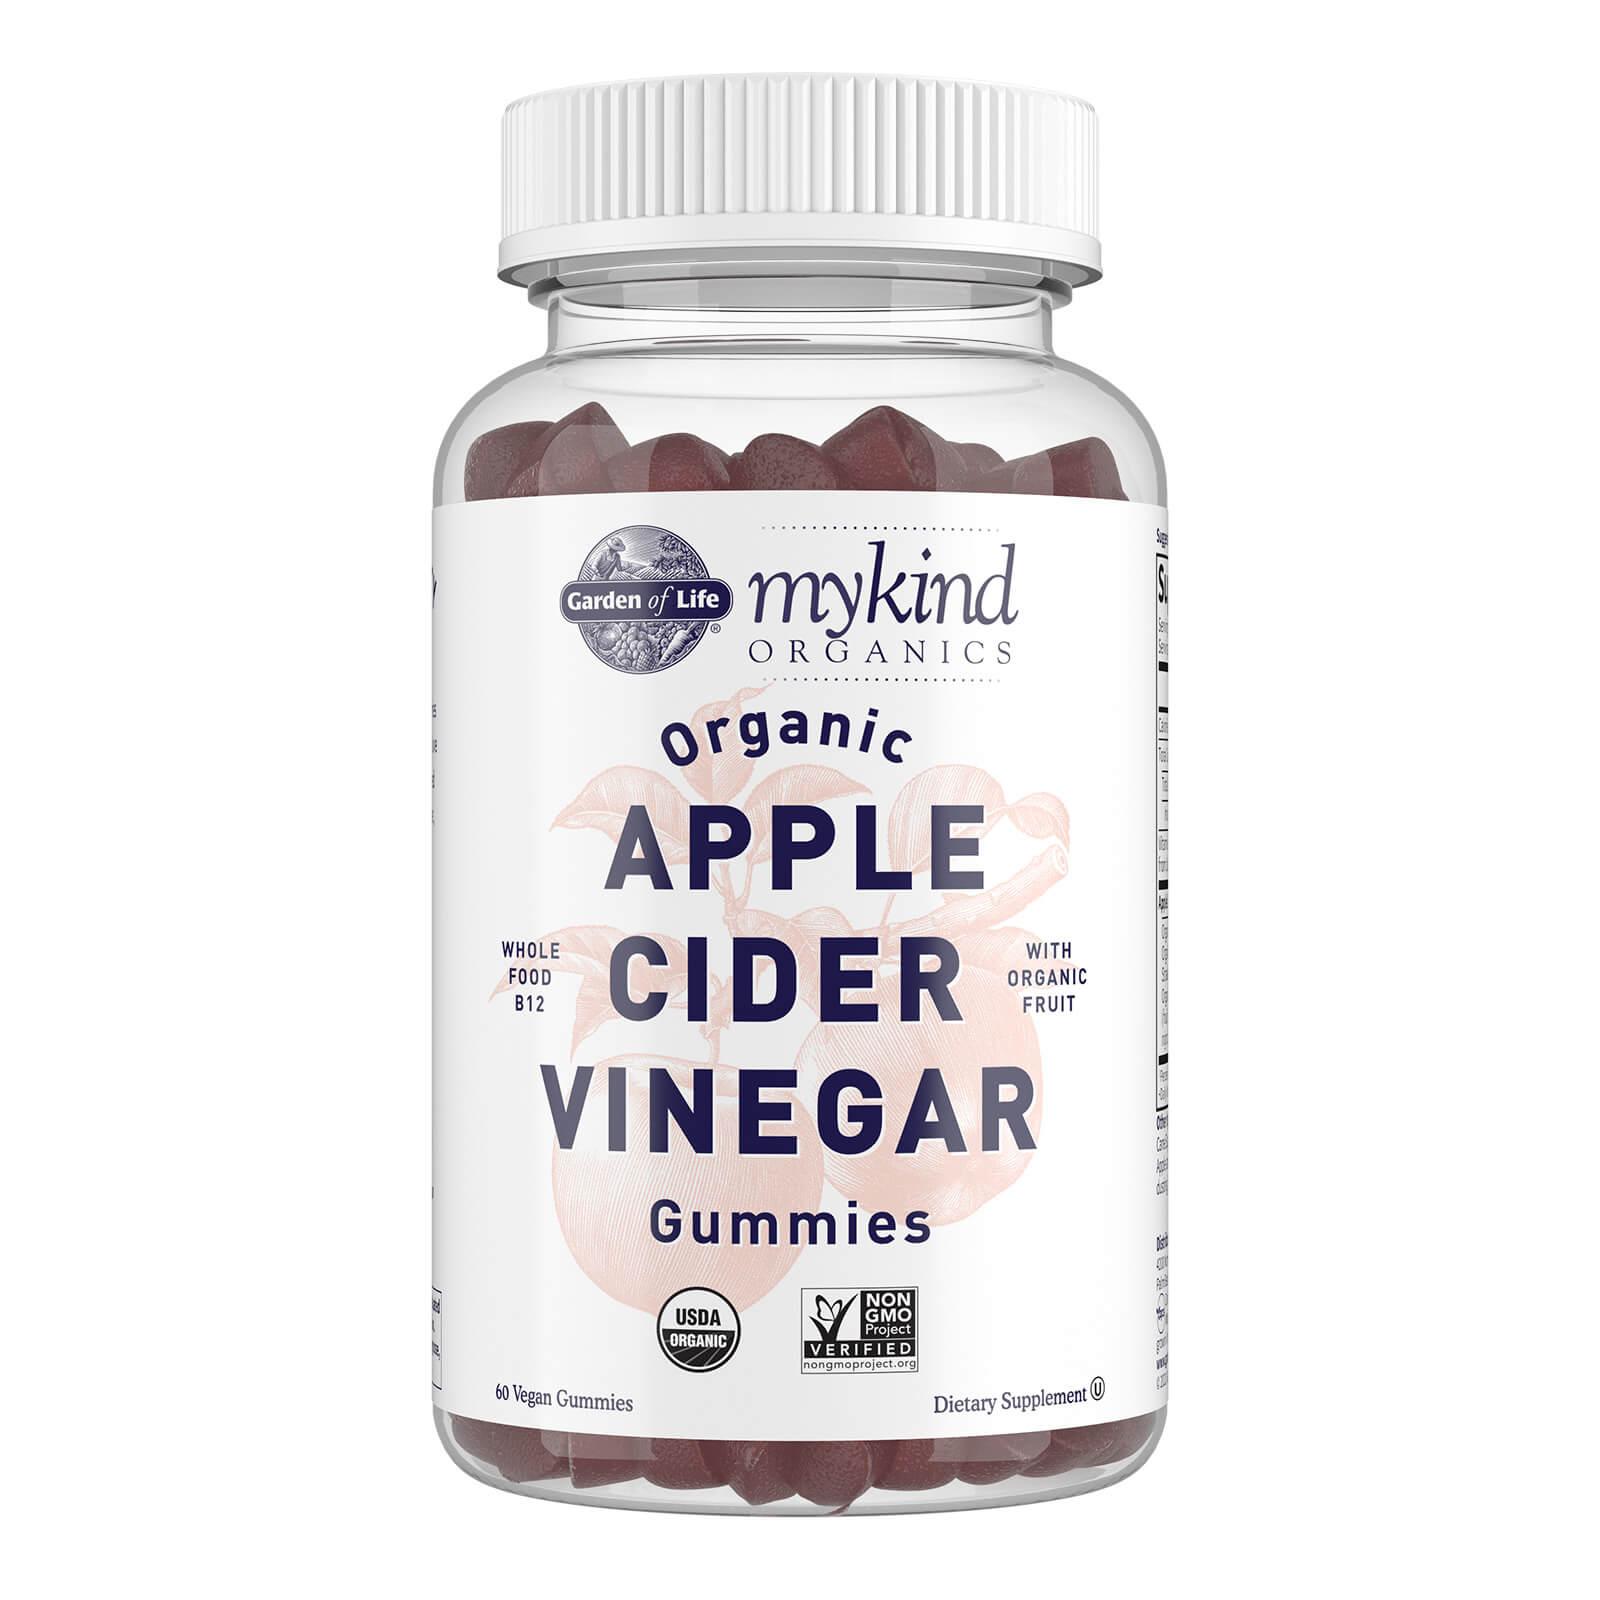 Mykind Organics Appelciderazijn 60 Gummies